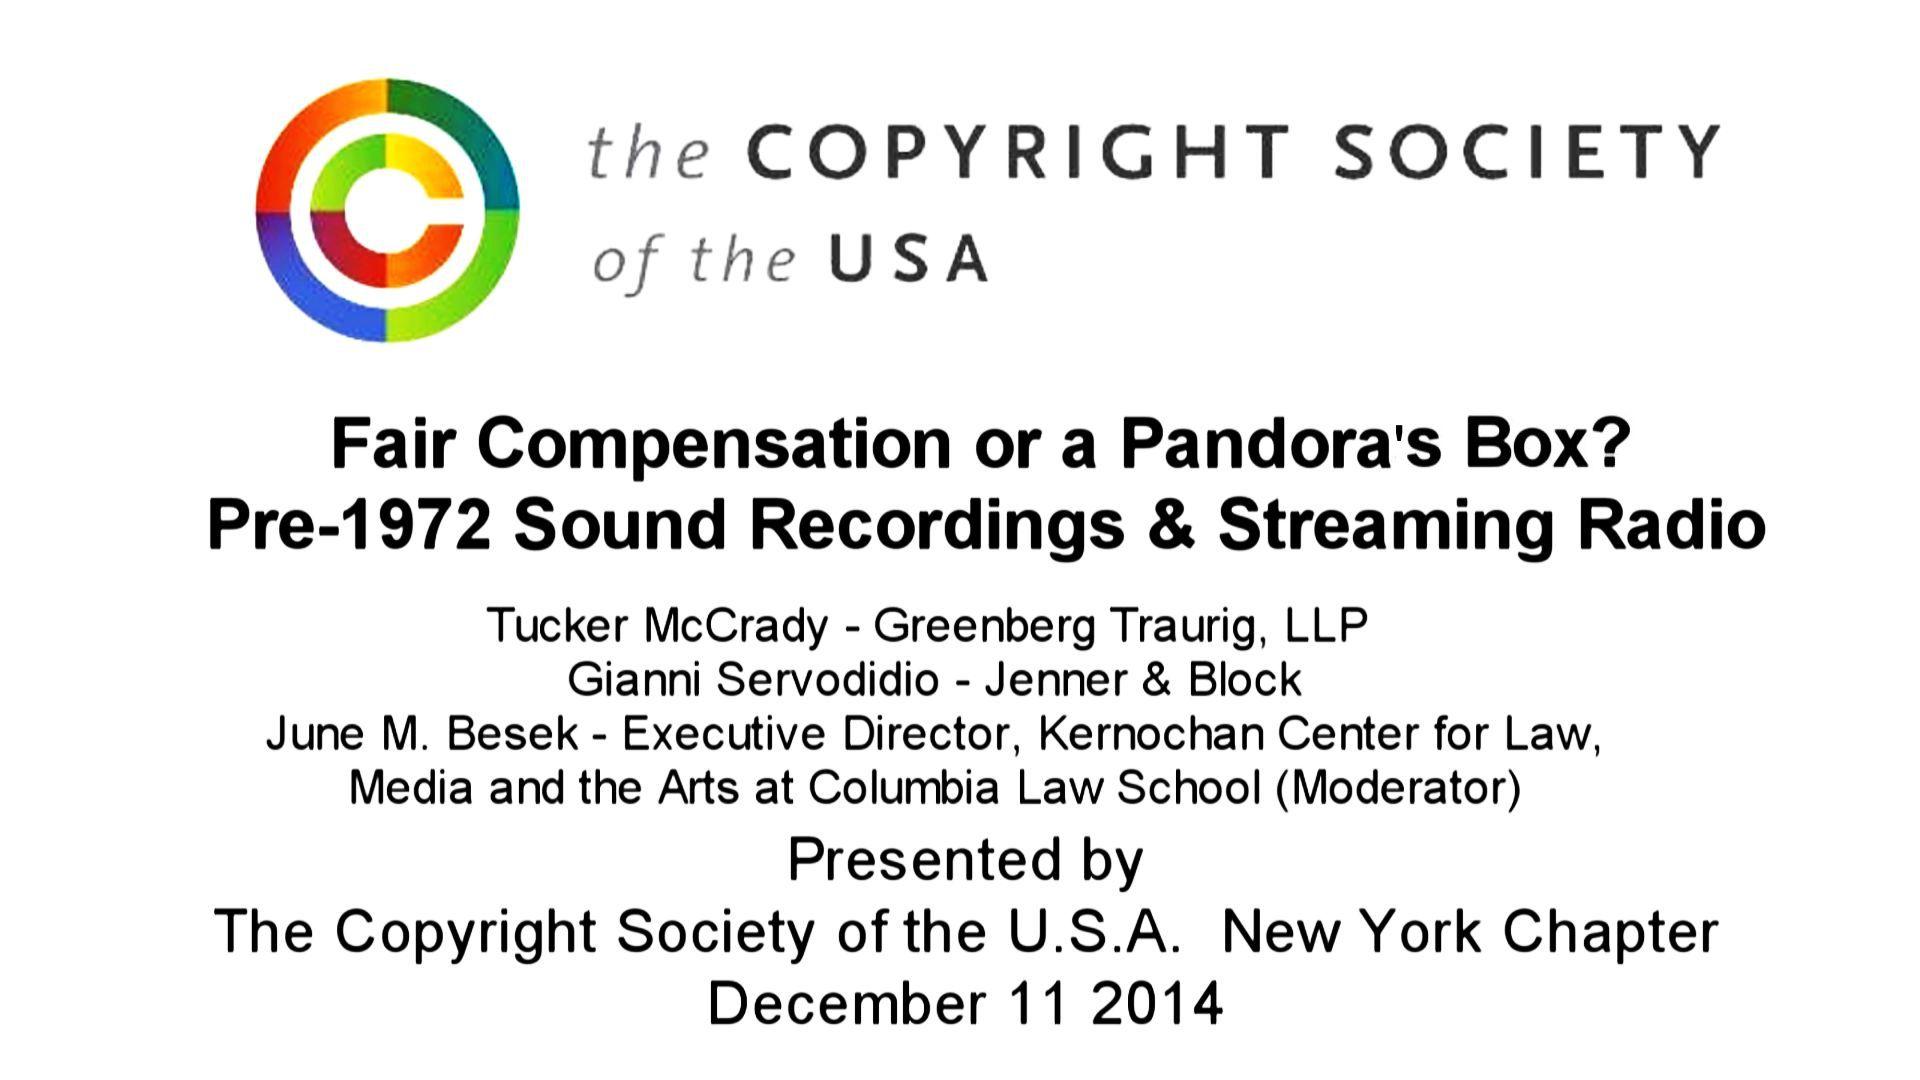 CSUSA - Fair Compensation or a Pandora�s Box? Pre-1972 Sound Recordings & Streaming Radio -  December 11 2014